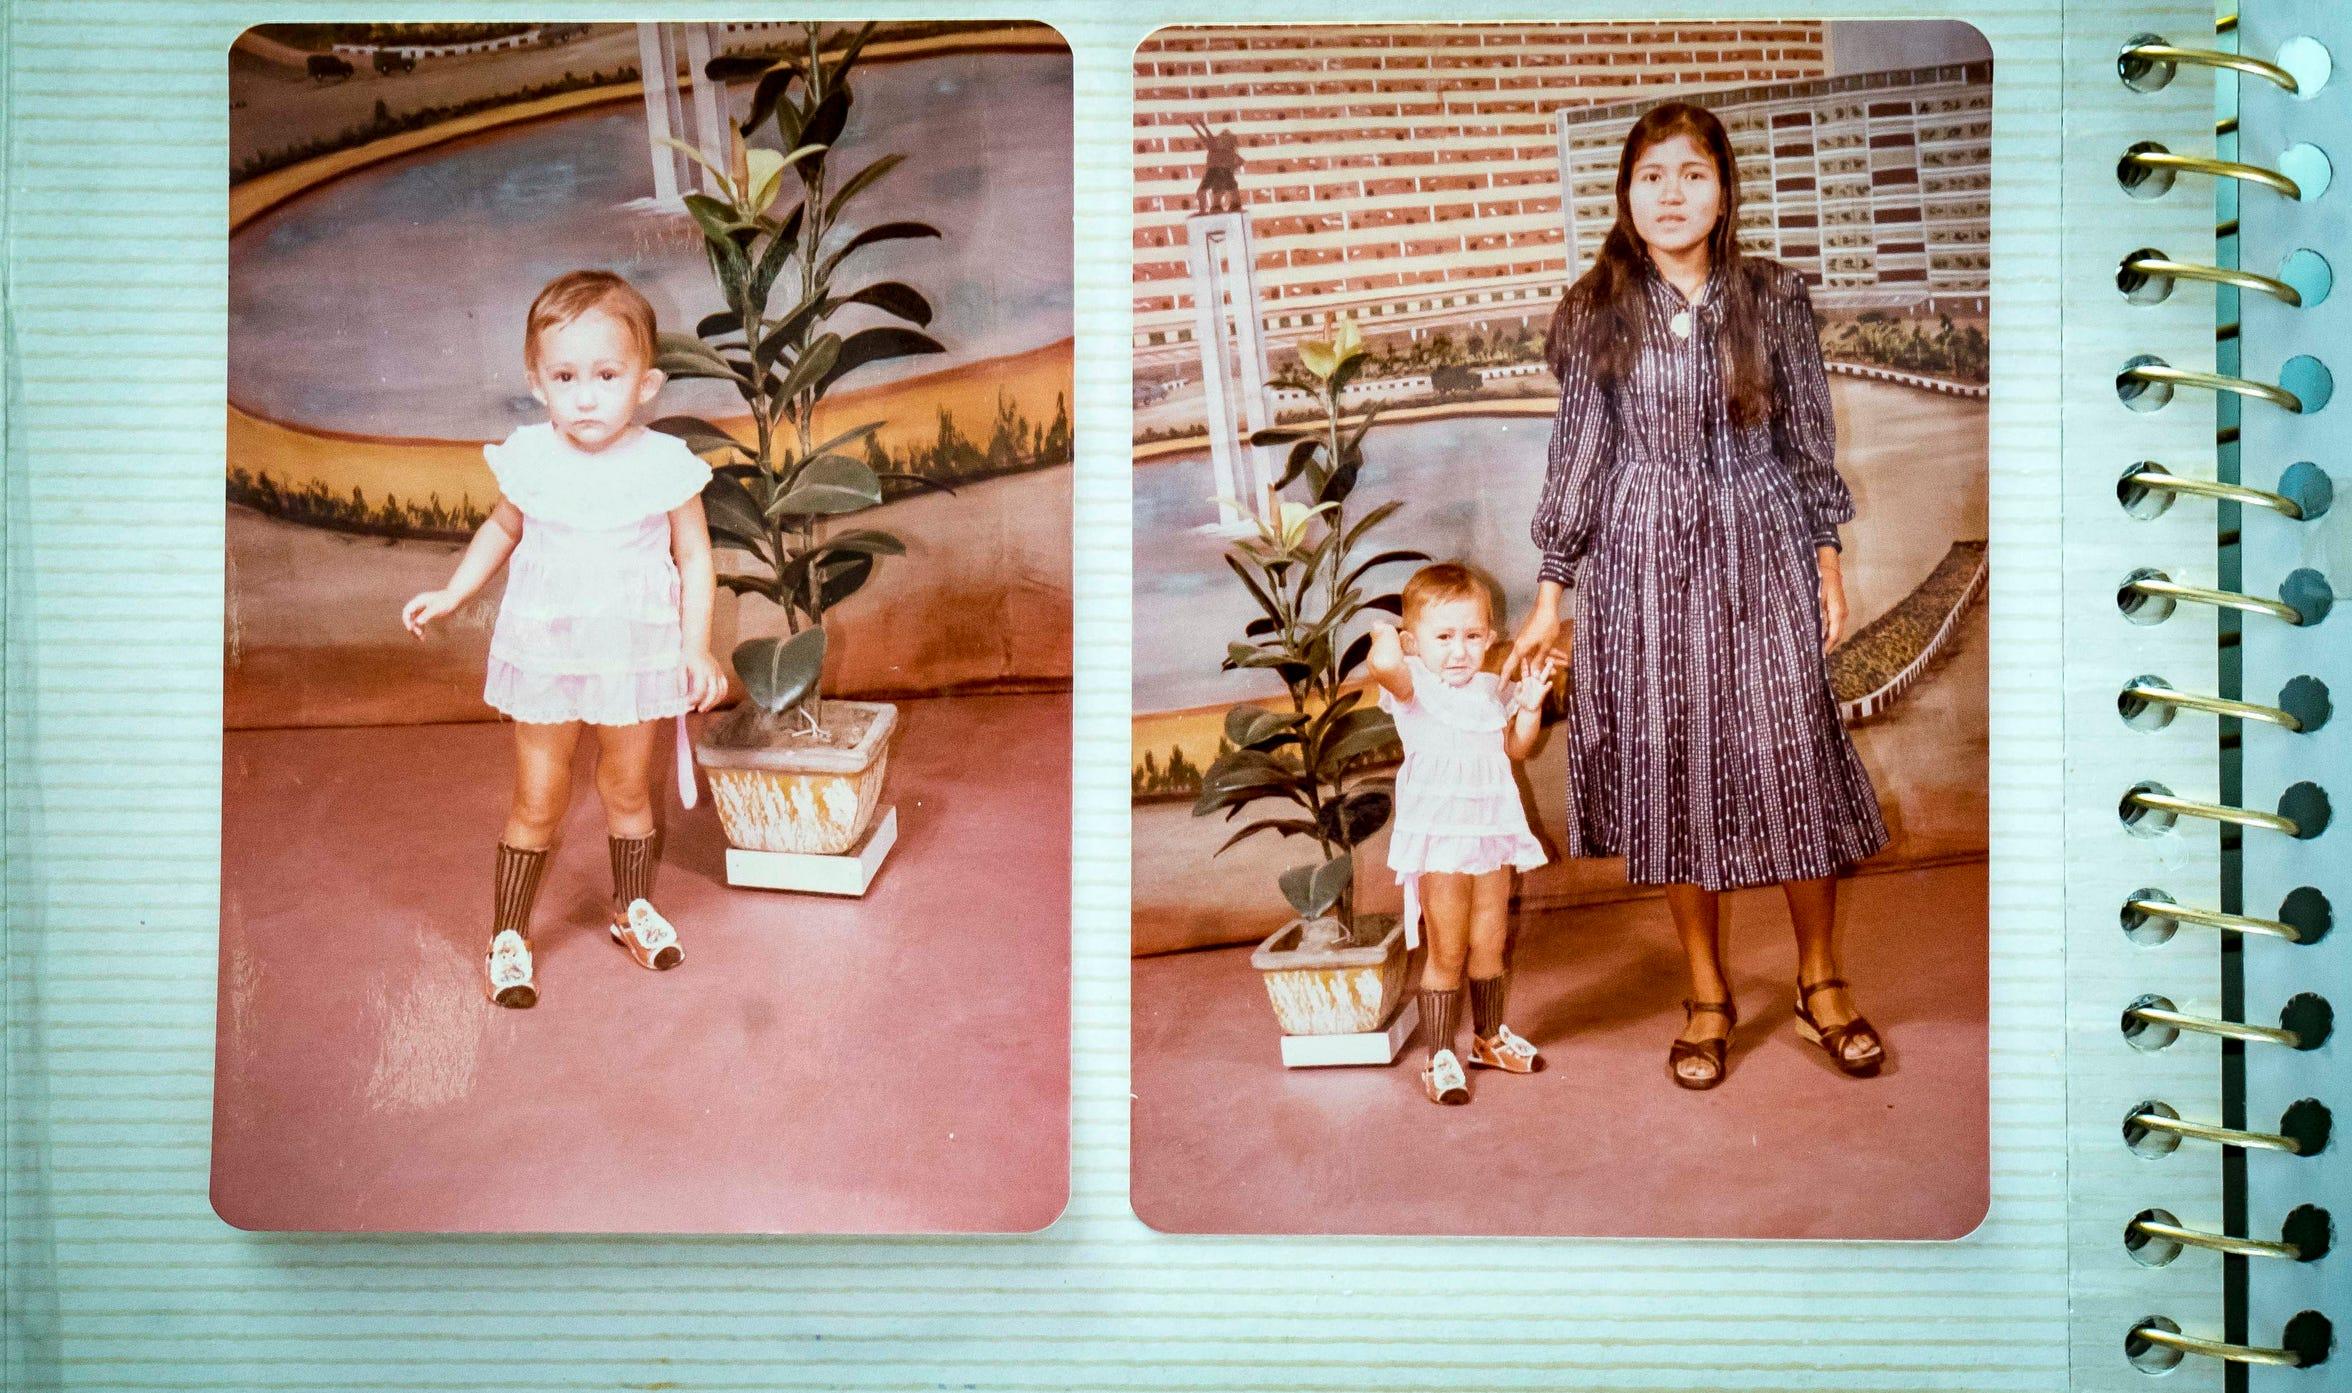 "Photo of A.W ""Dub"" Barron's daughter Yusimanidar Abdullah, left, with her mother, Zalikha Abdullah, in Lhoksukon, Indonesia, 1976, from family photo album."